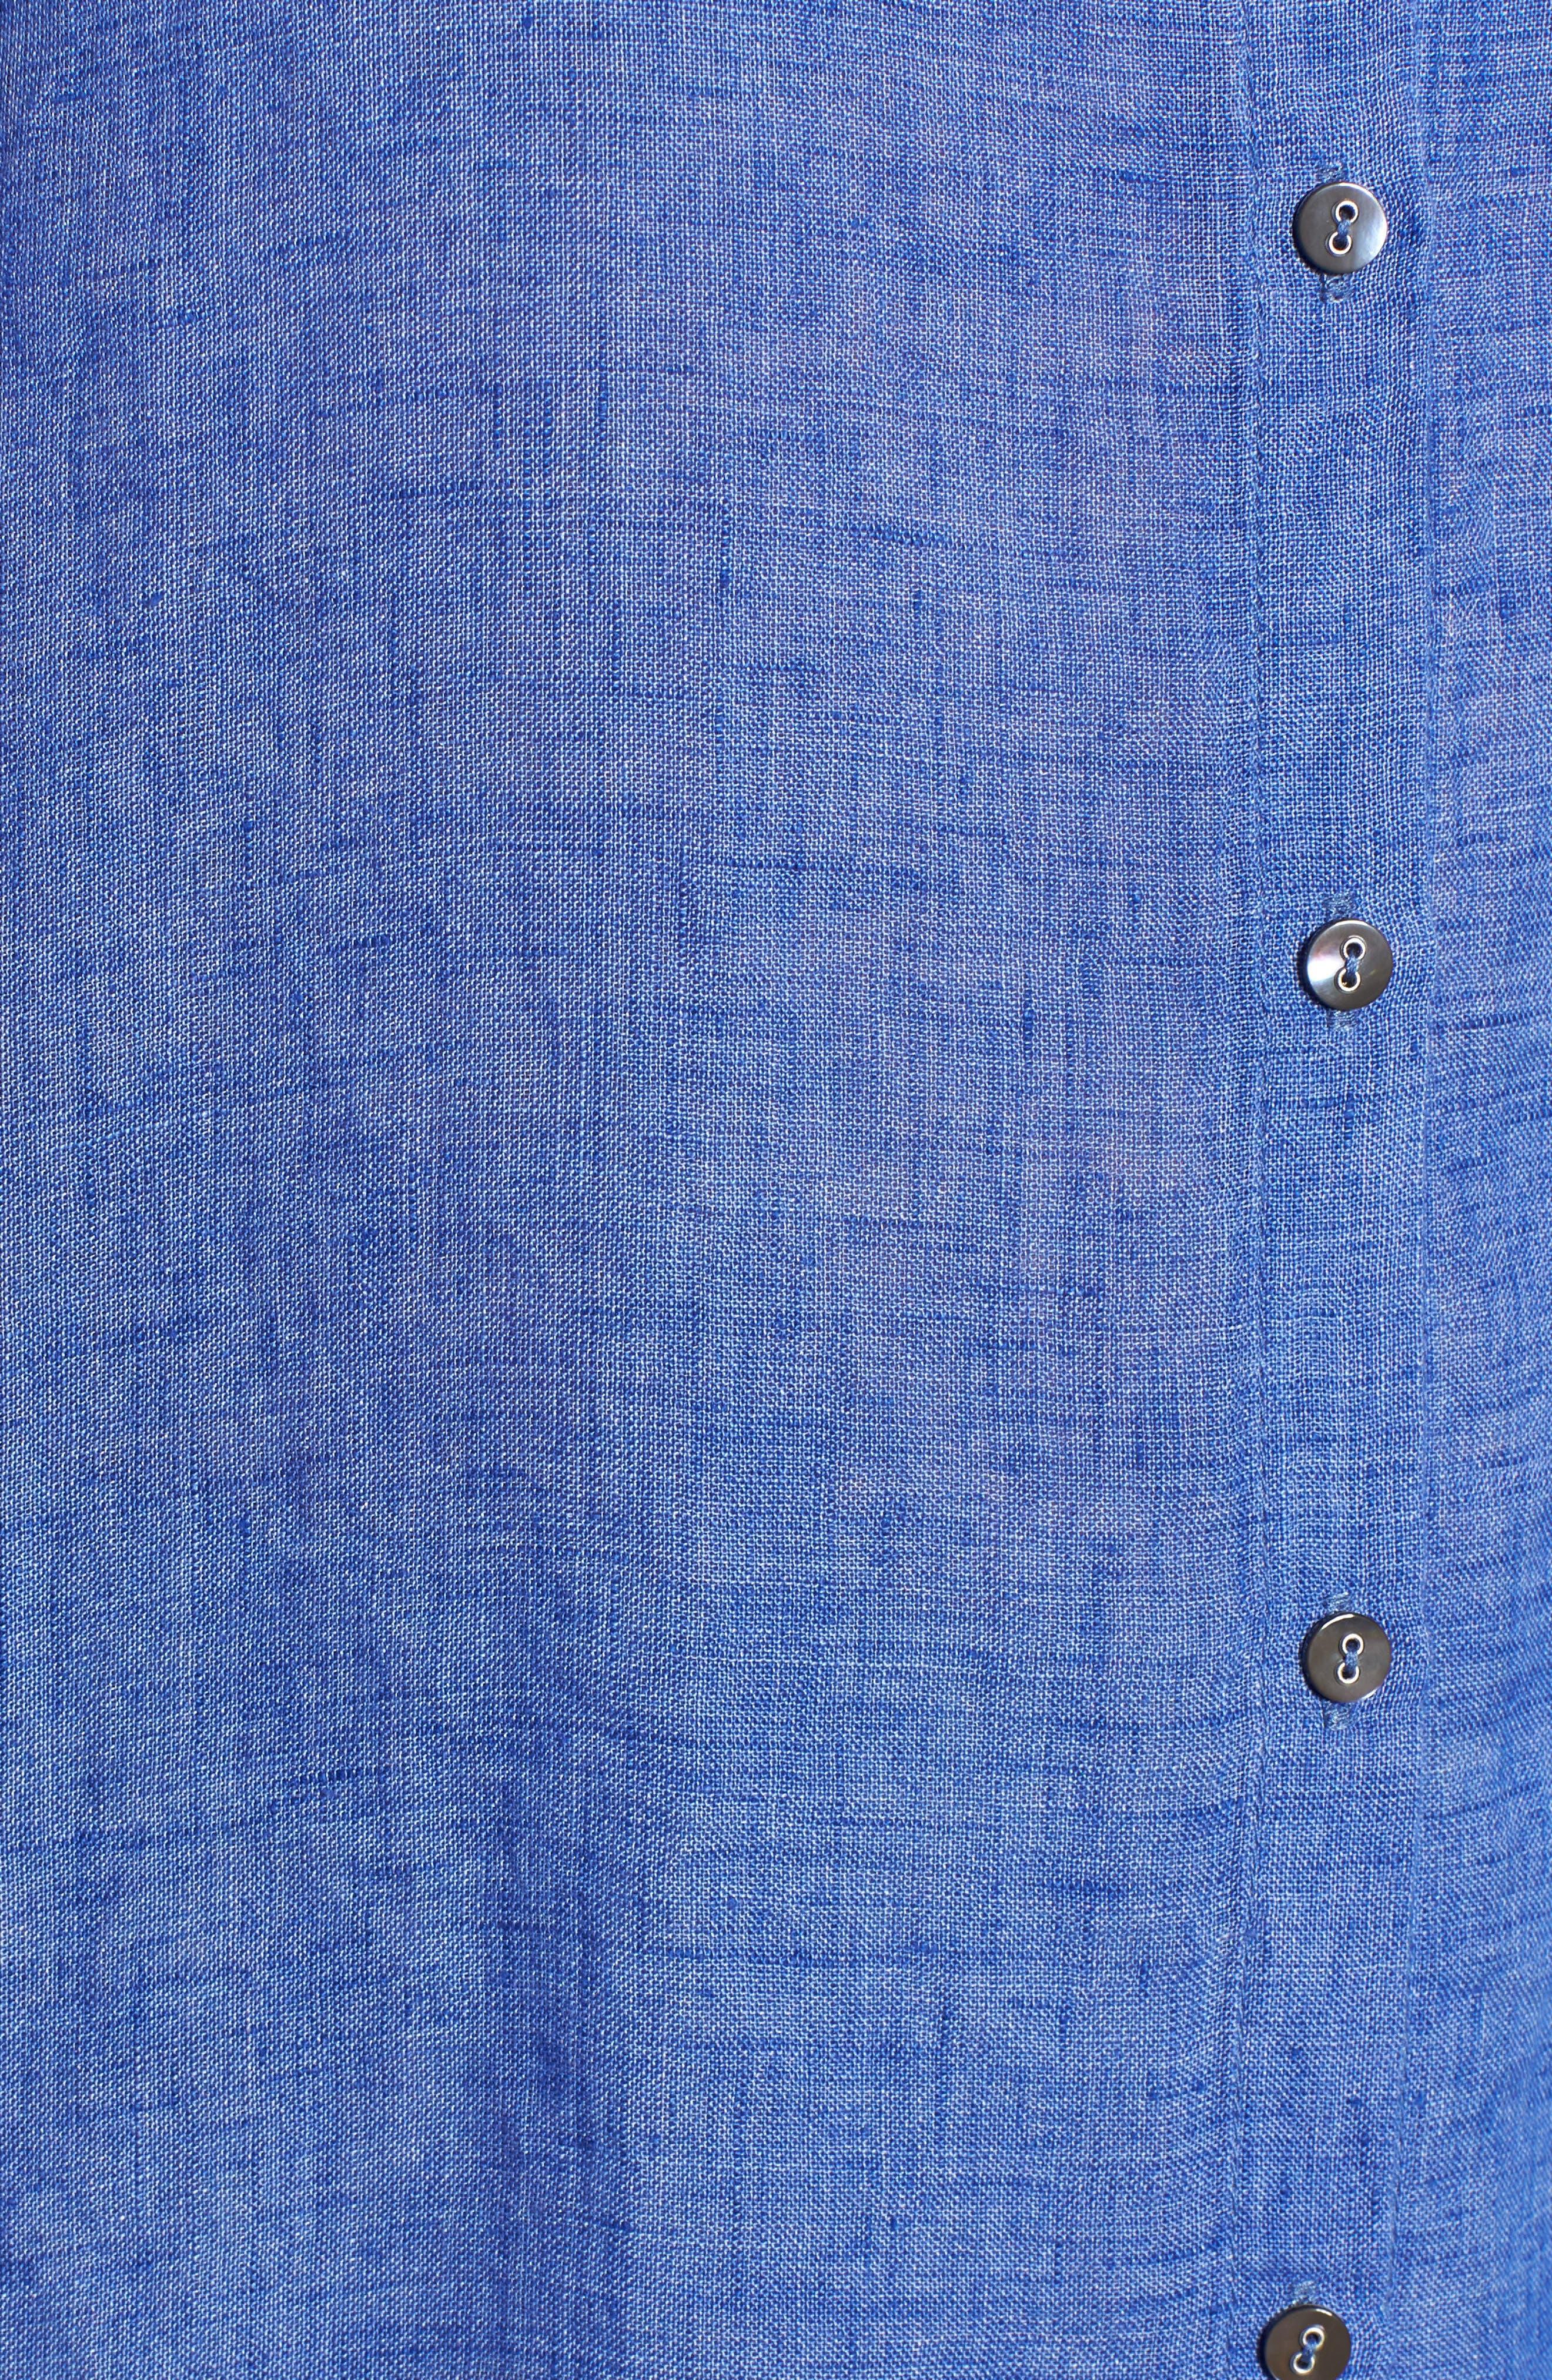 Joy Ride Linen Tunic Top,                             Alternate thumbnail 5, color,                             Ultramarine